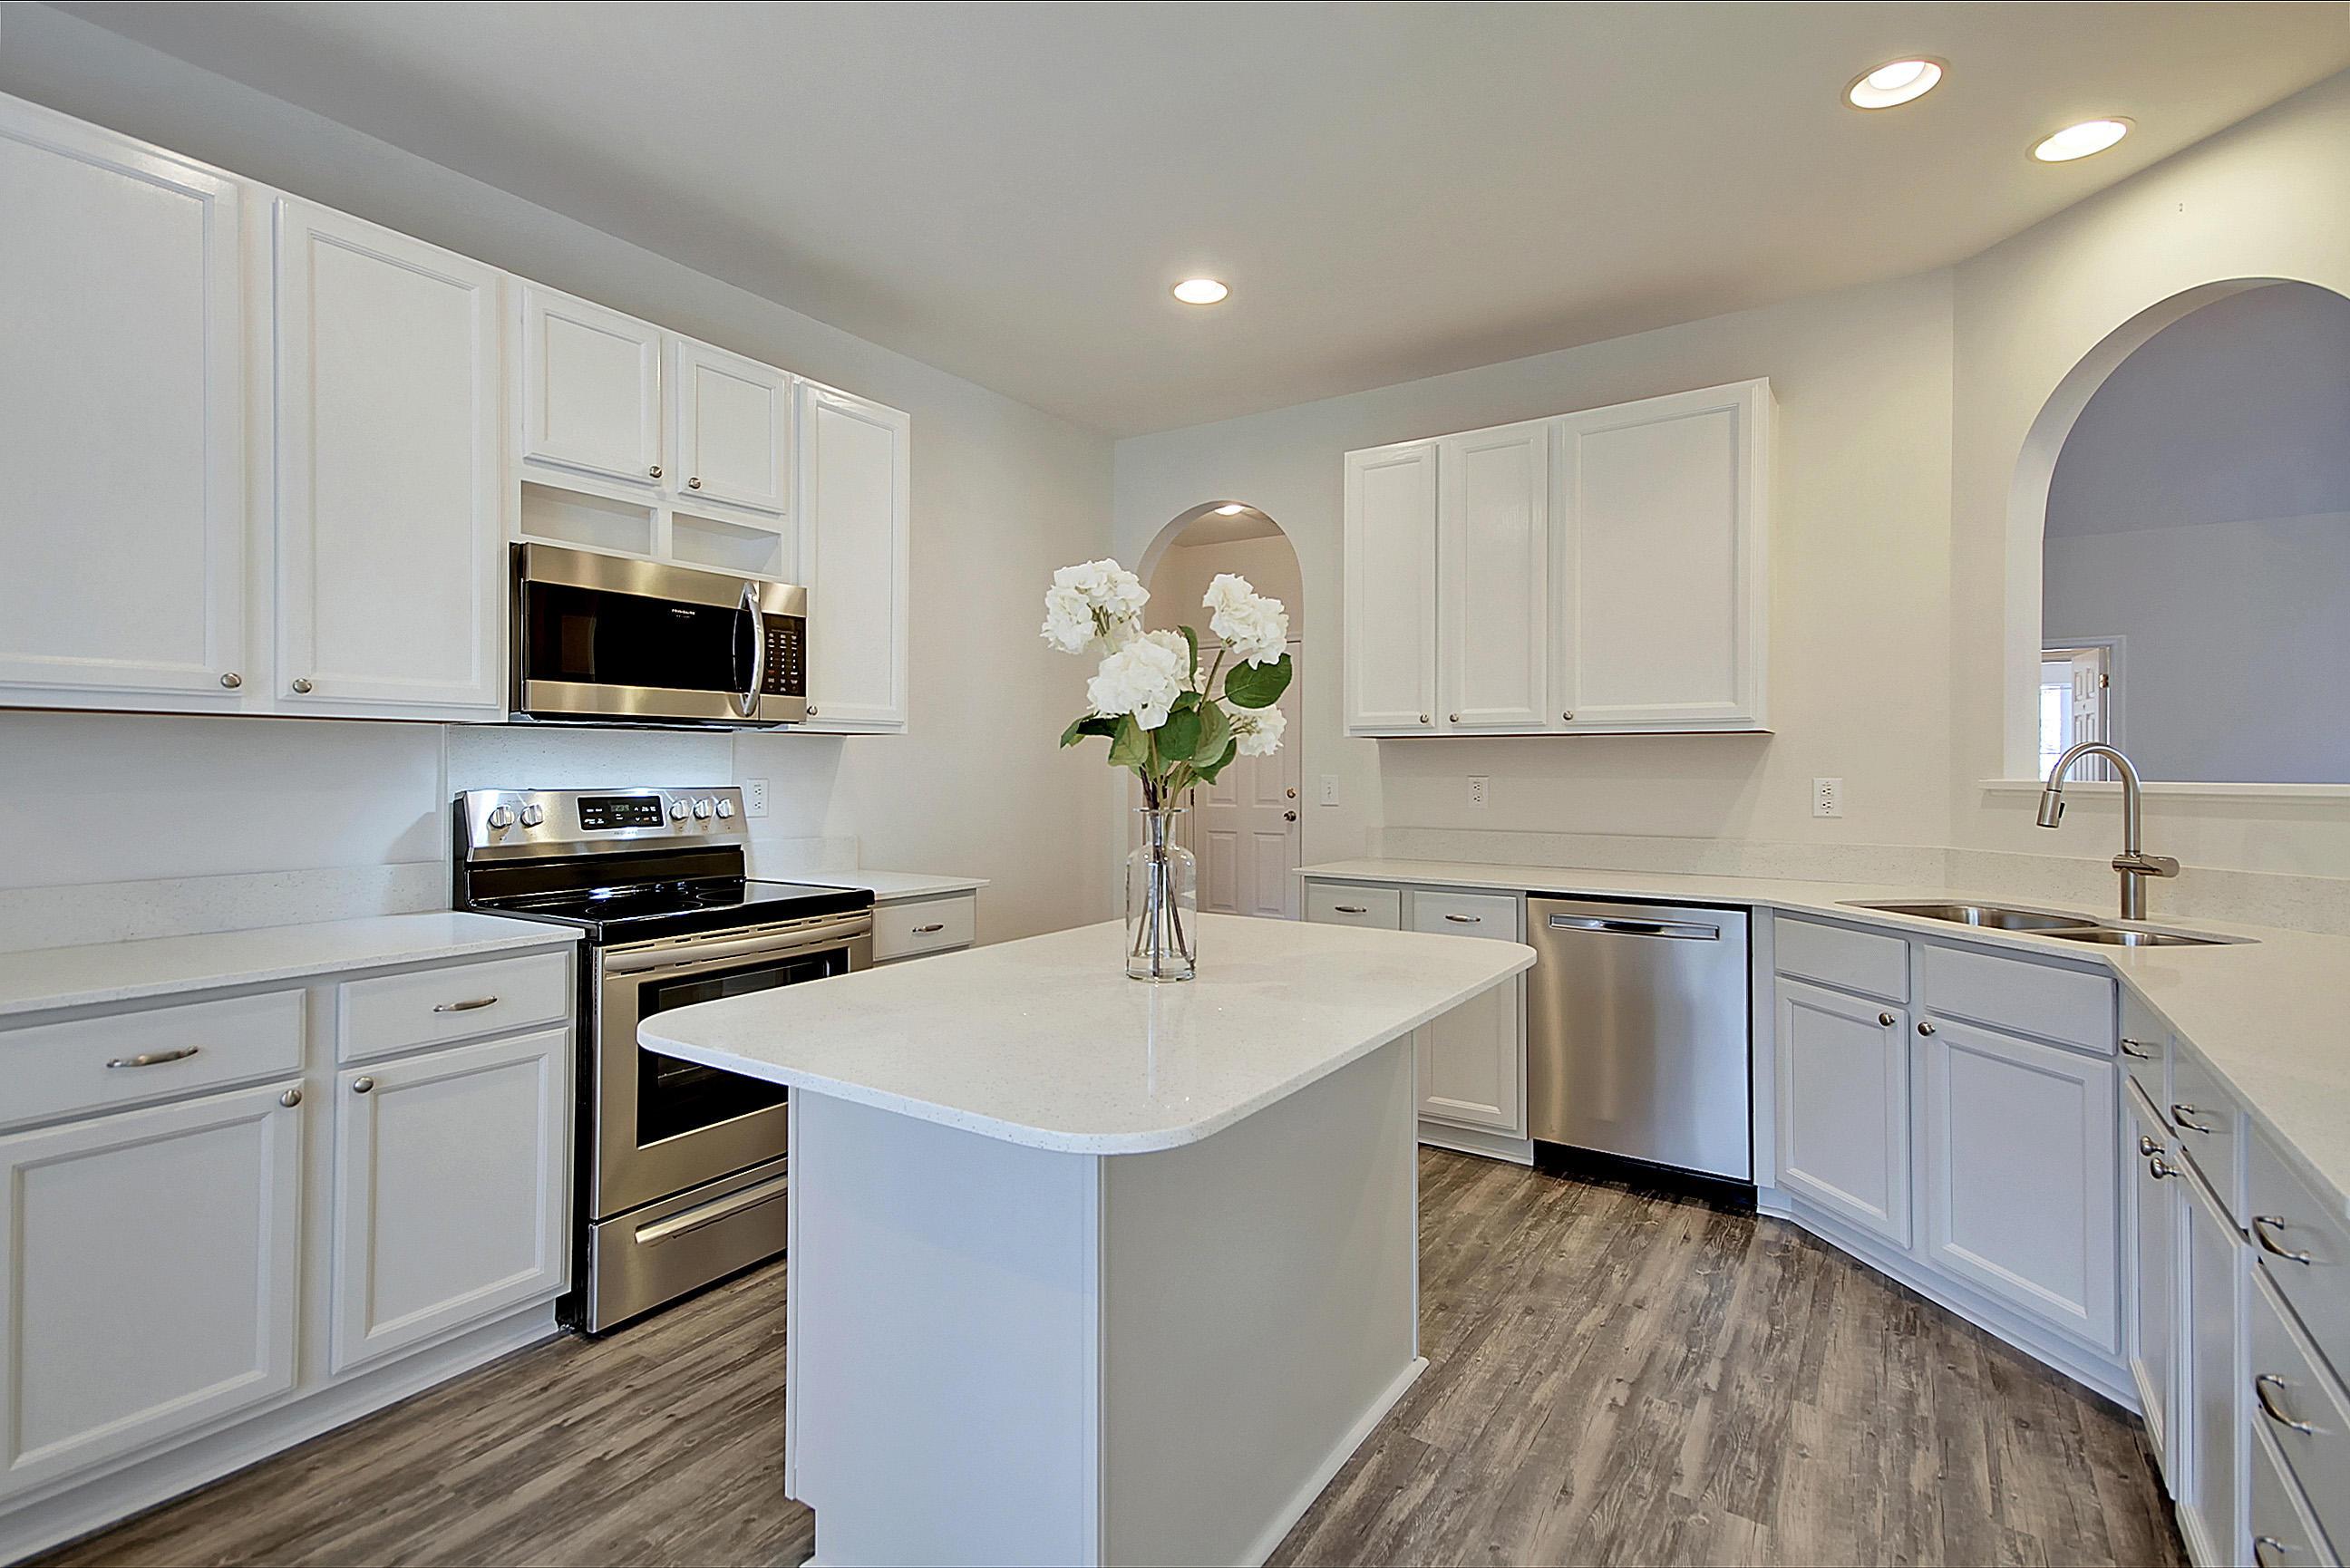 Dunes West Homes For Sale - 2656 Palmetto Hall, Mount Pleasant, SC - 4